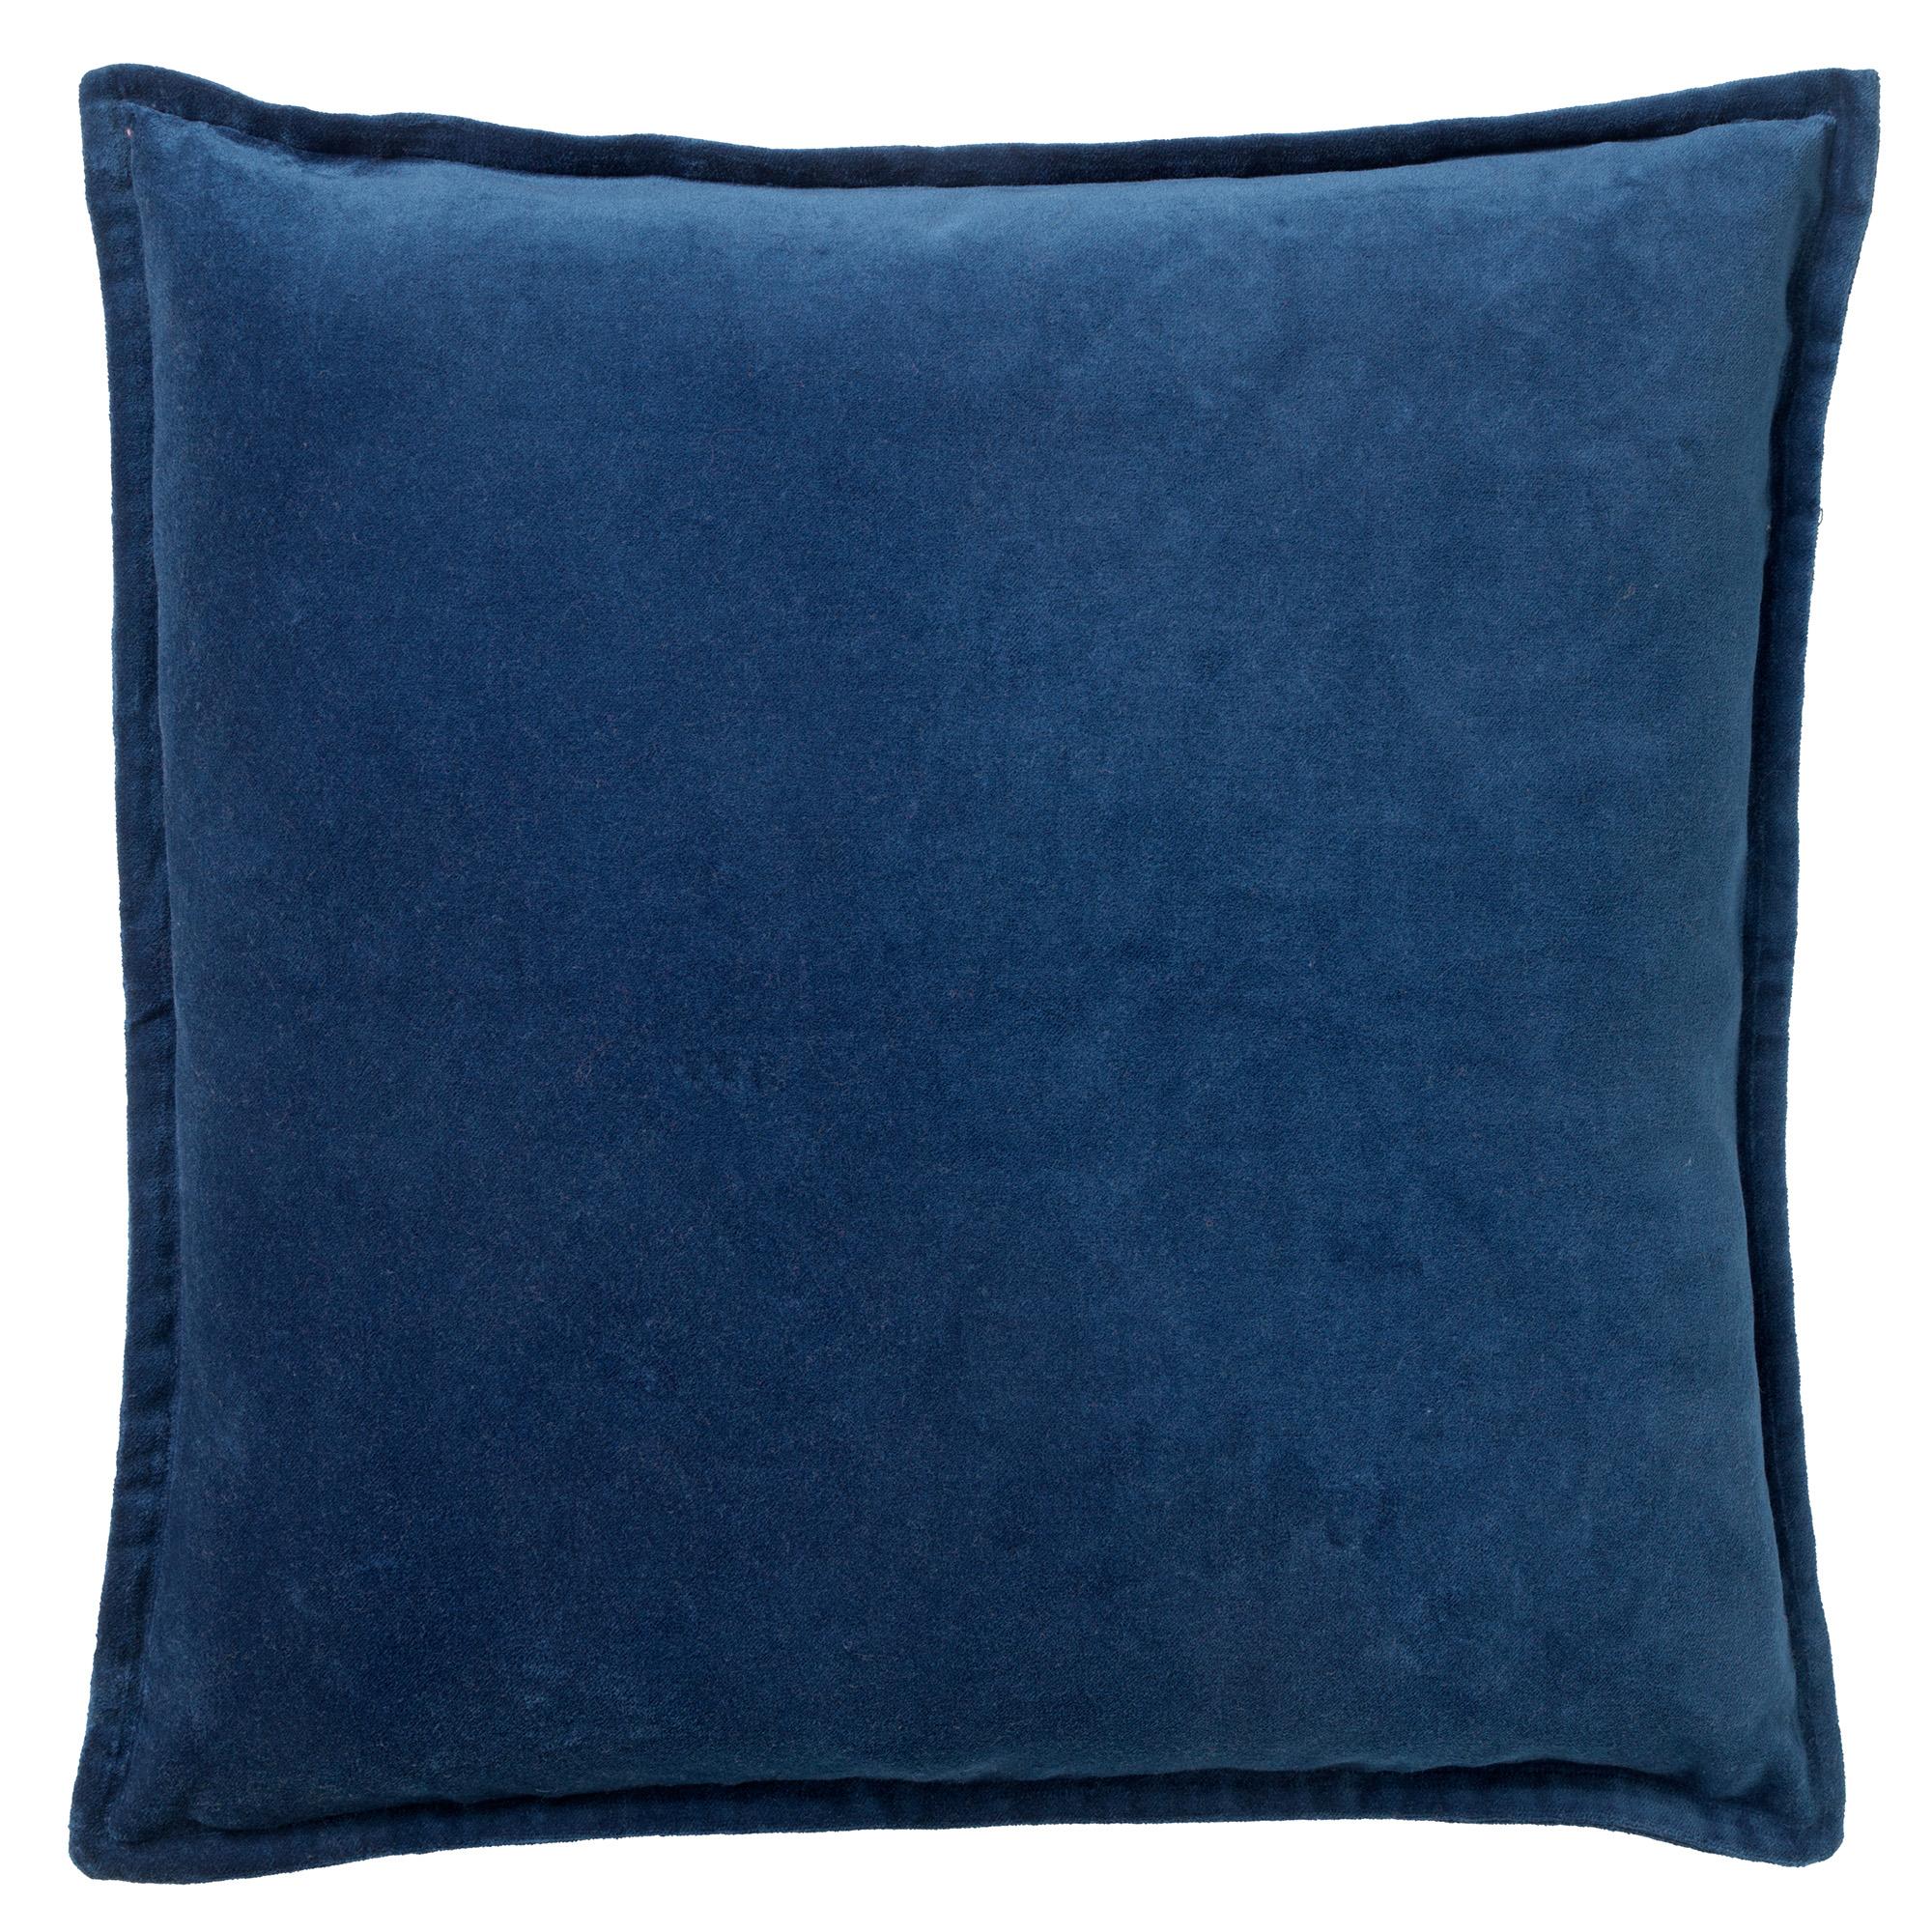 Coussin en velours Bleu saphir 50x50